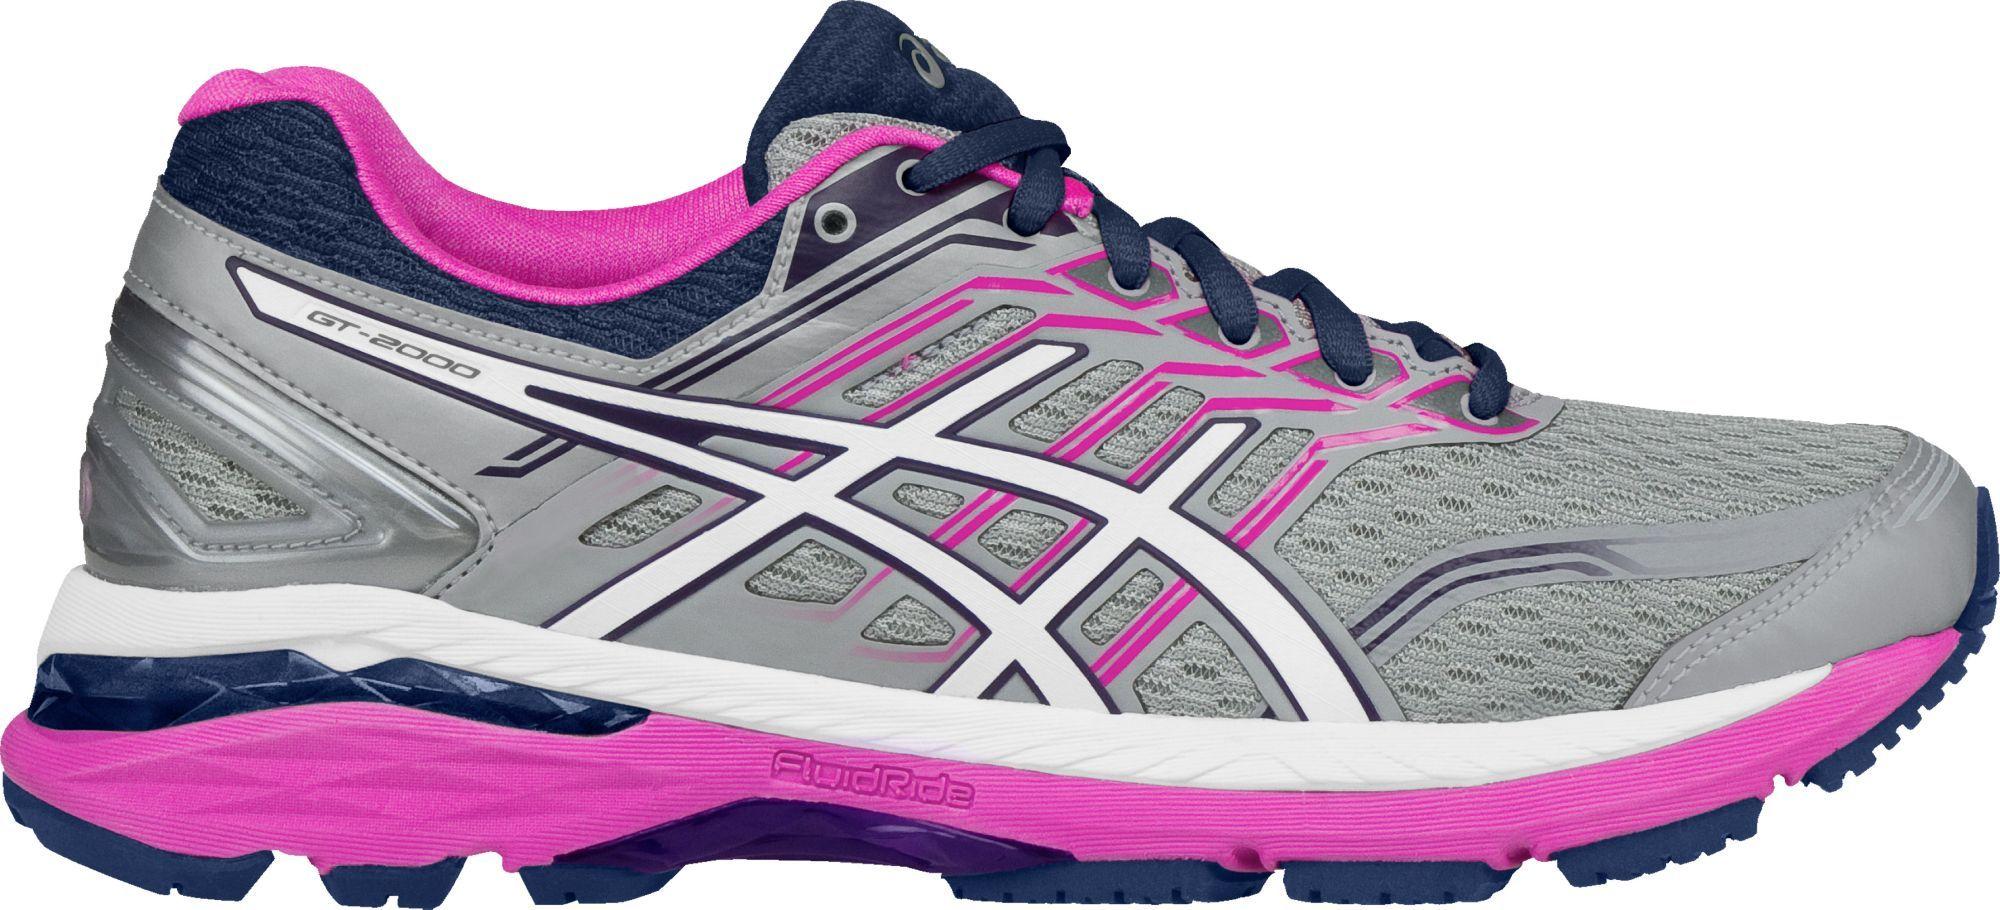 Asics Women's GT-2000 5 Running Shoes, Size: 11.0, Gray ...